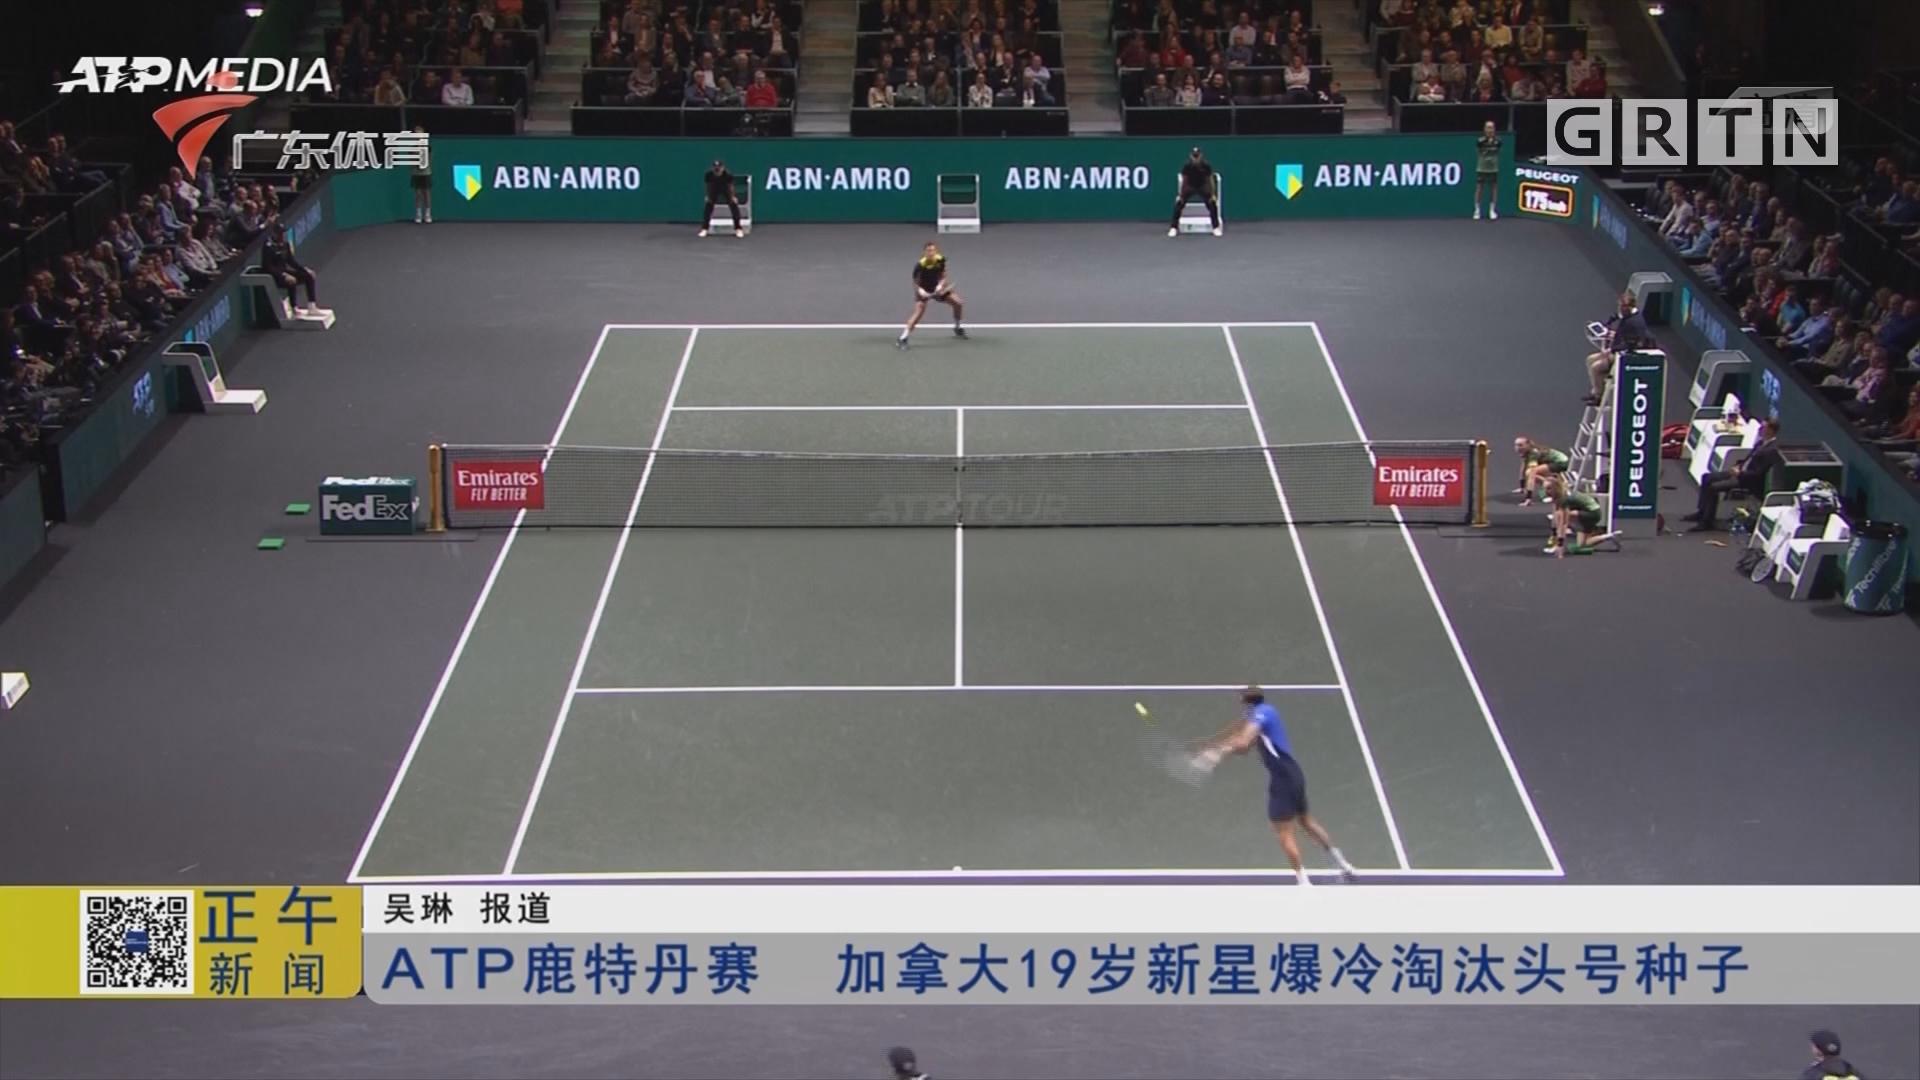 ATP鹿特丹赛 加拿大19岁新星爆冷淘汰头号种子